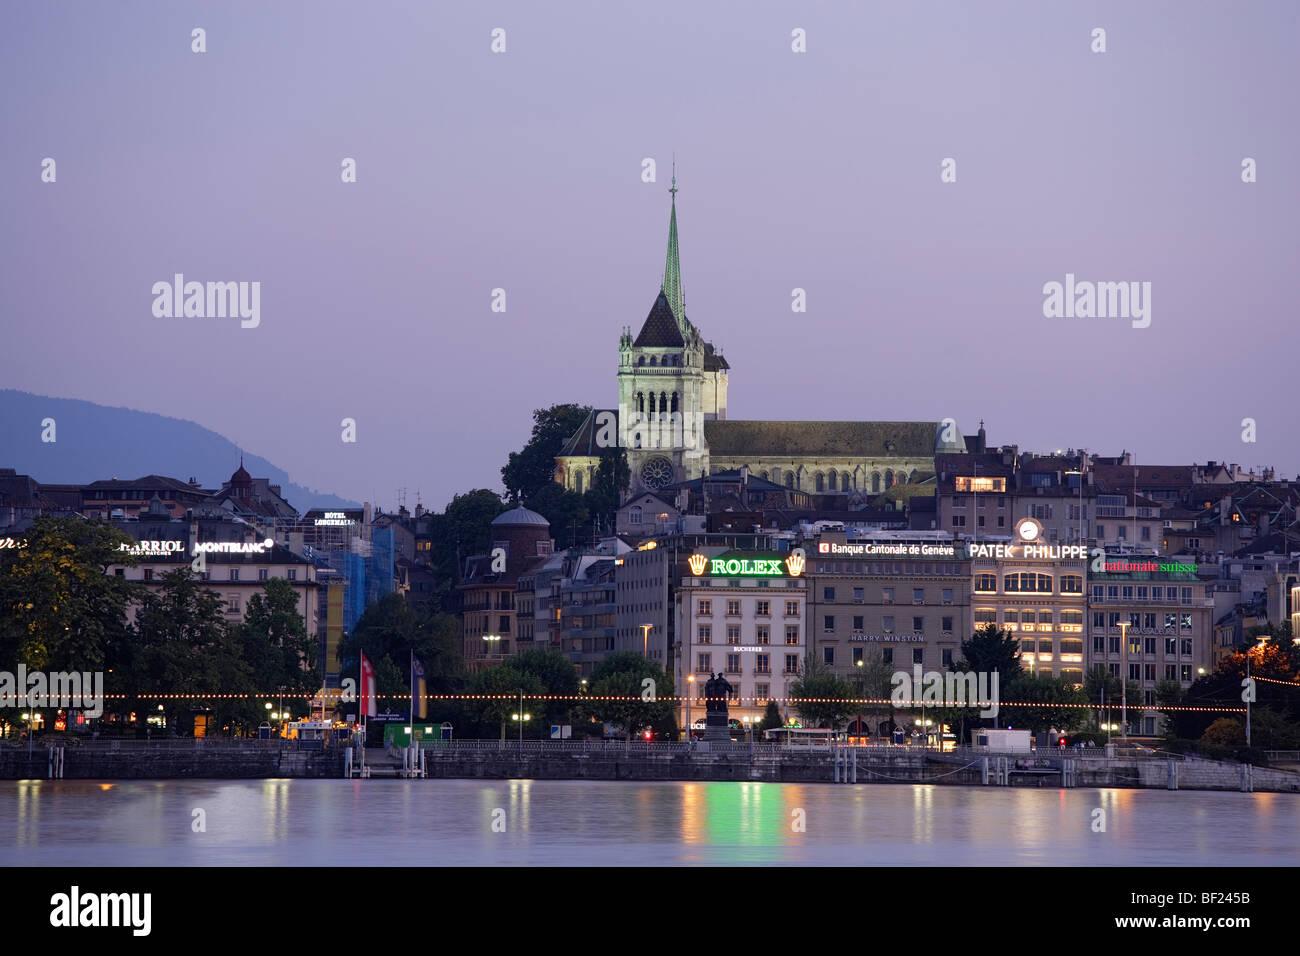 St. Pierre Cathedral at night, Geneva, Canton of Geneva, Switzerland - Stock Image